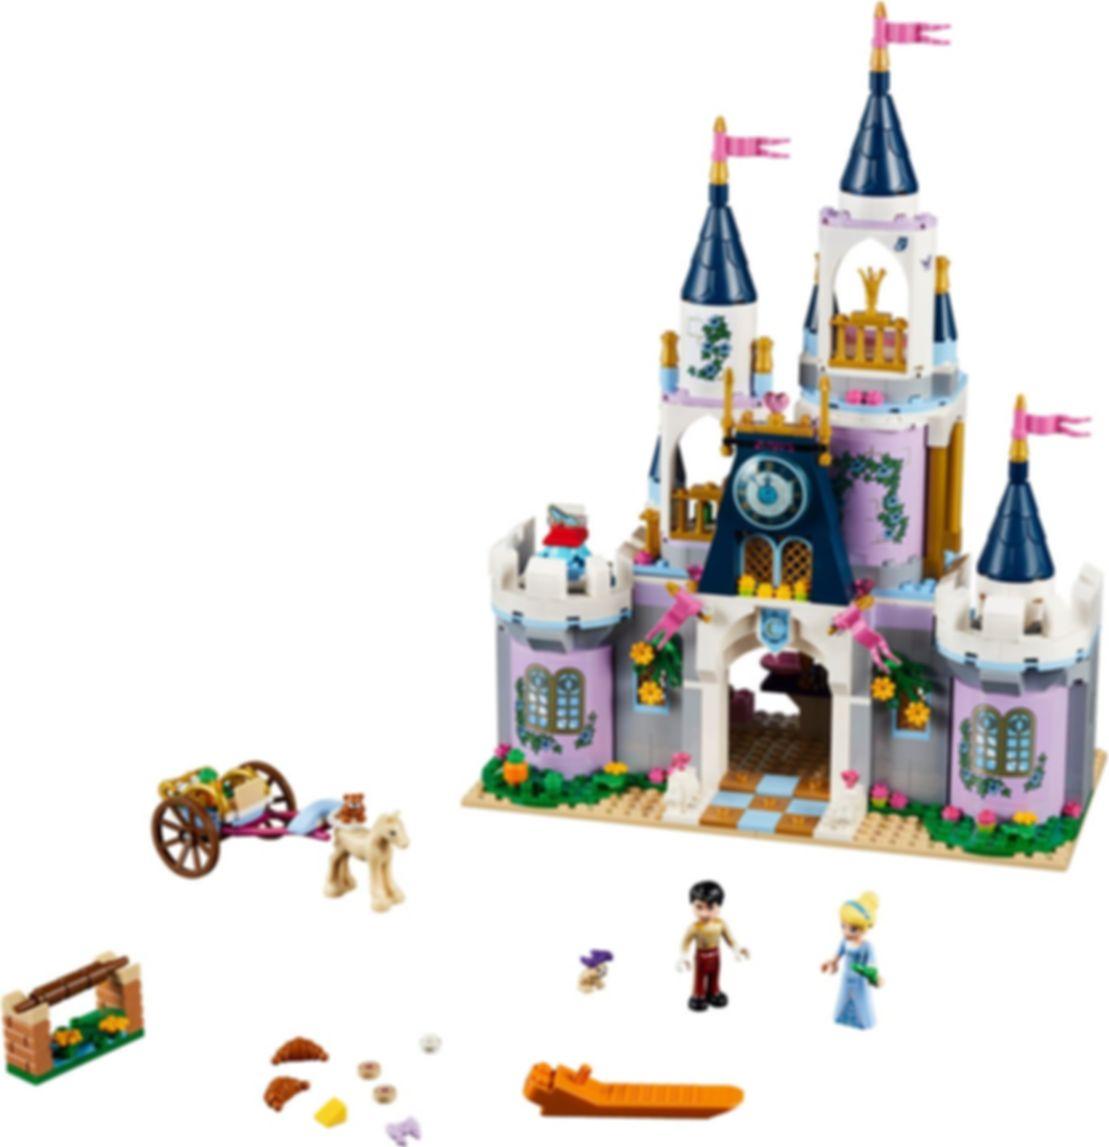 Cinderella's Dream Castle components